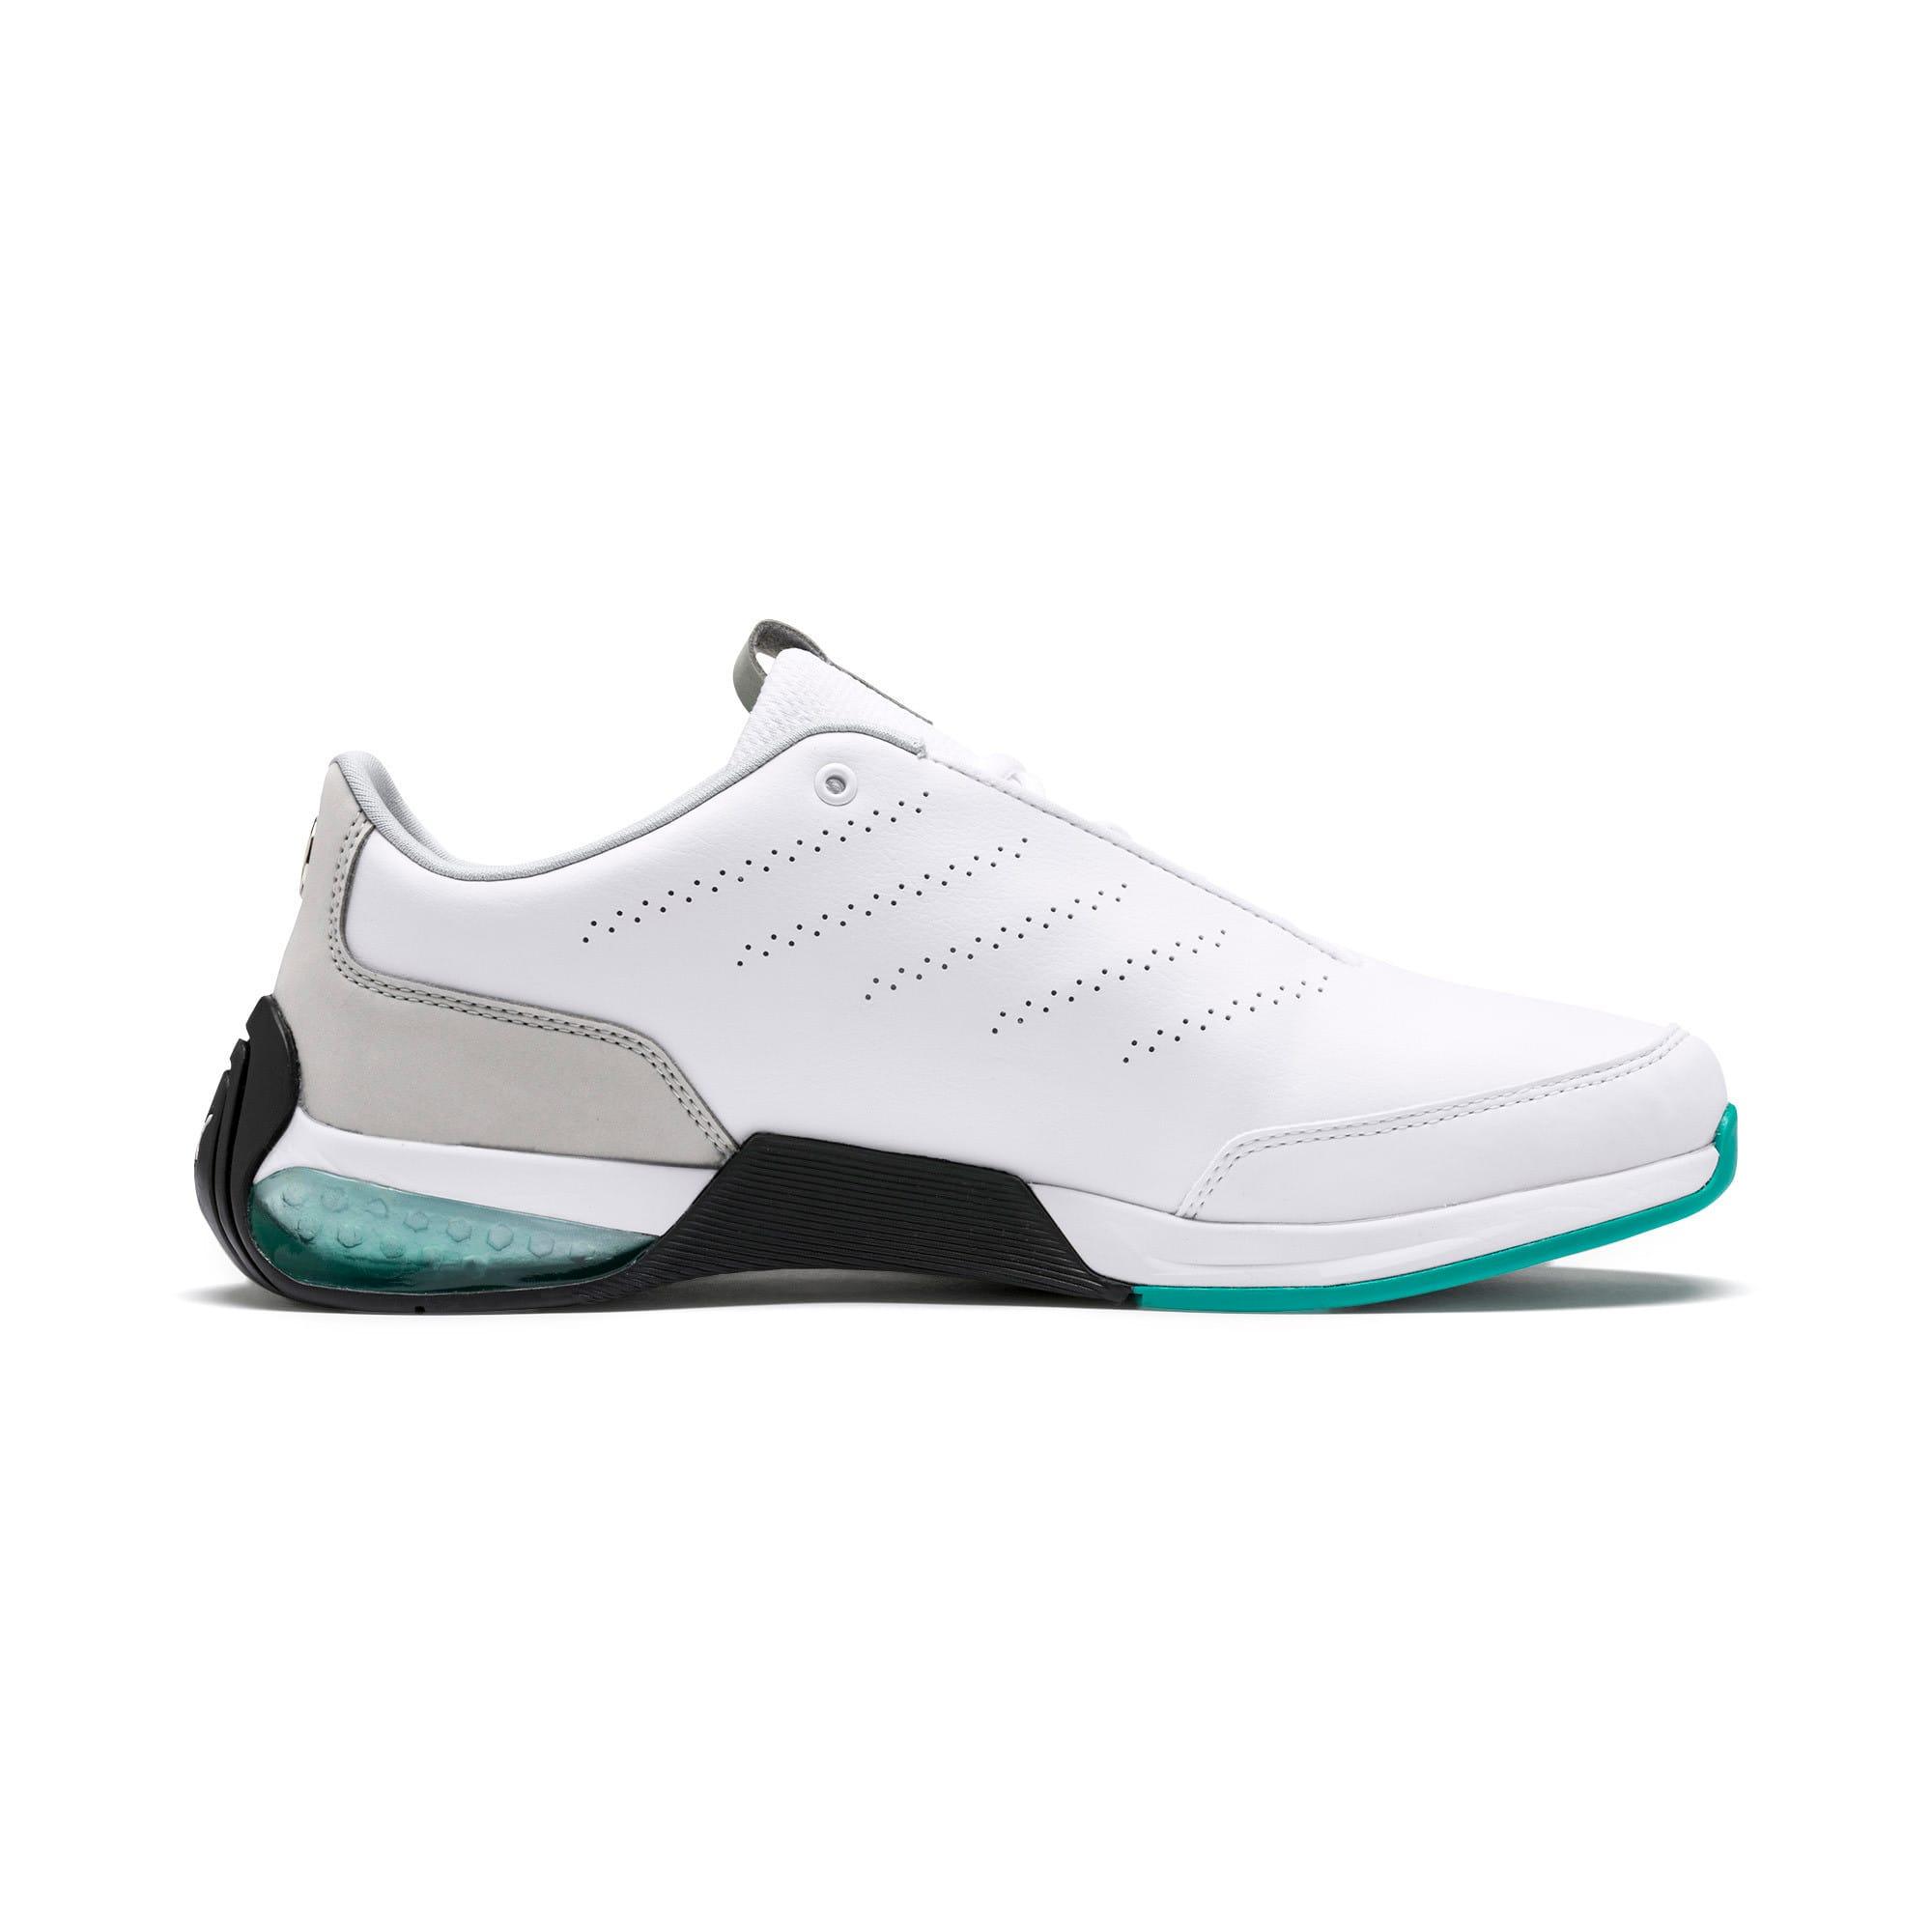 Thumbnail 6 of Mercedes AMG Petronas Kart Cat X Training Shoes, Puma White-Mercedes Silver, medium